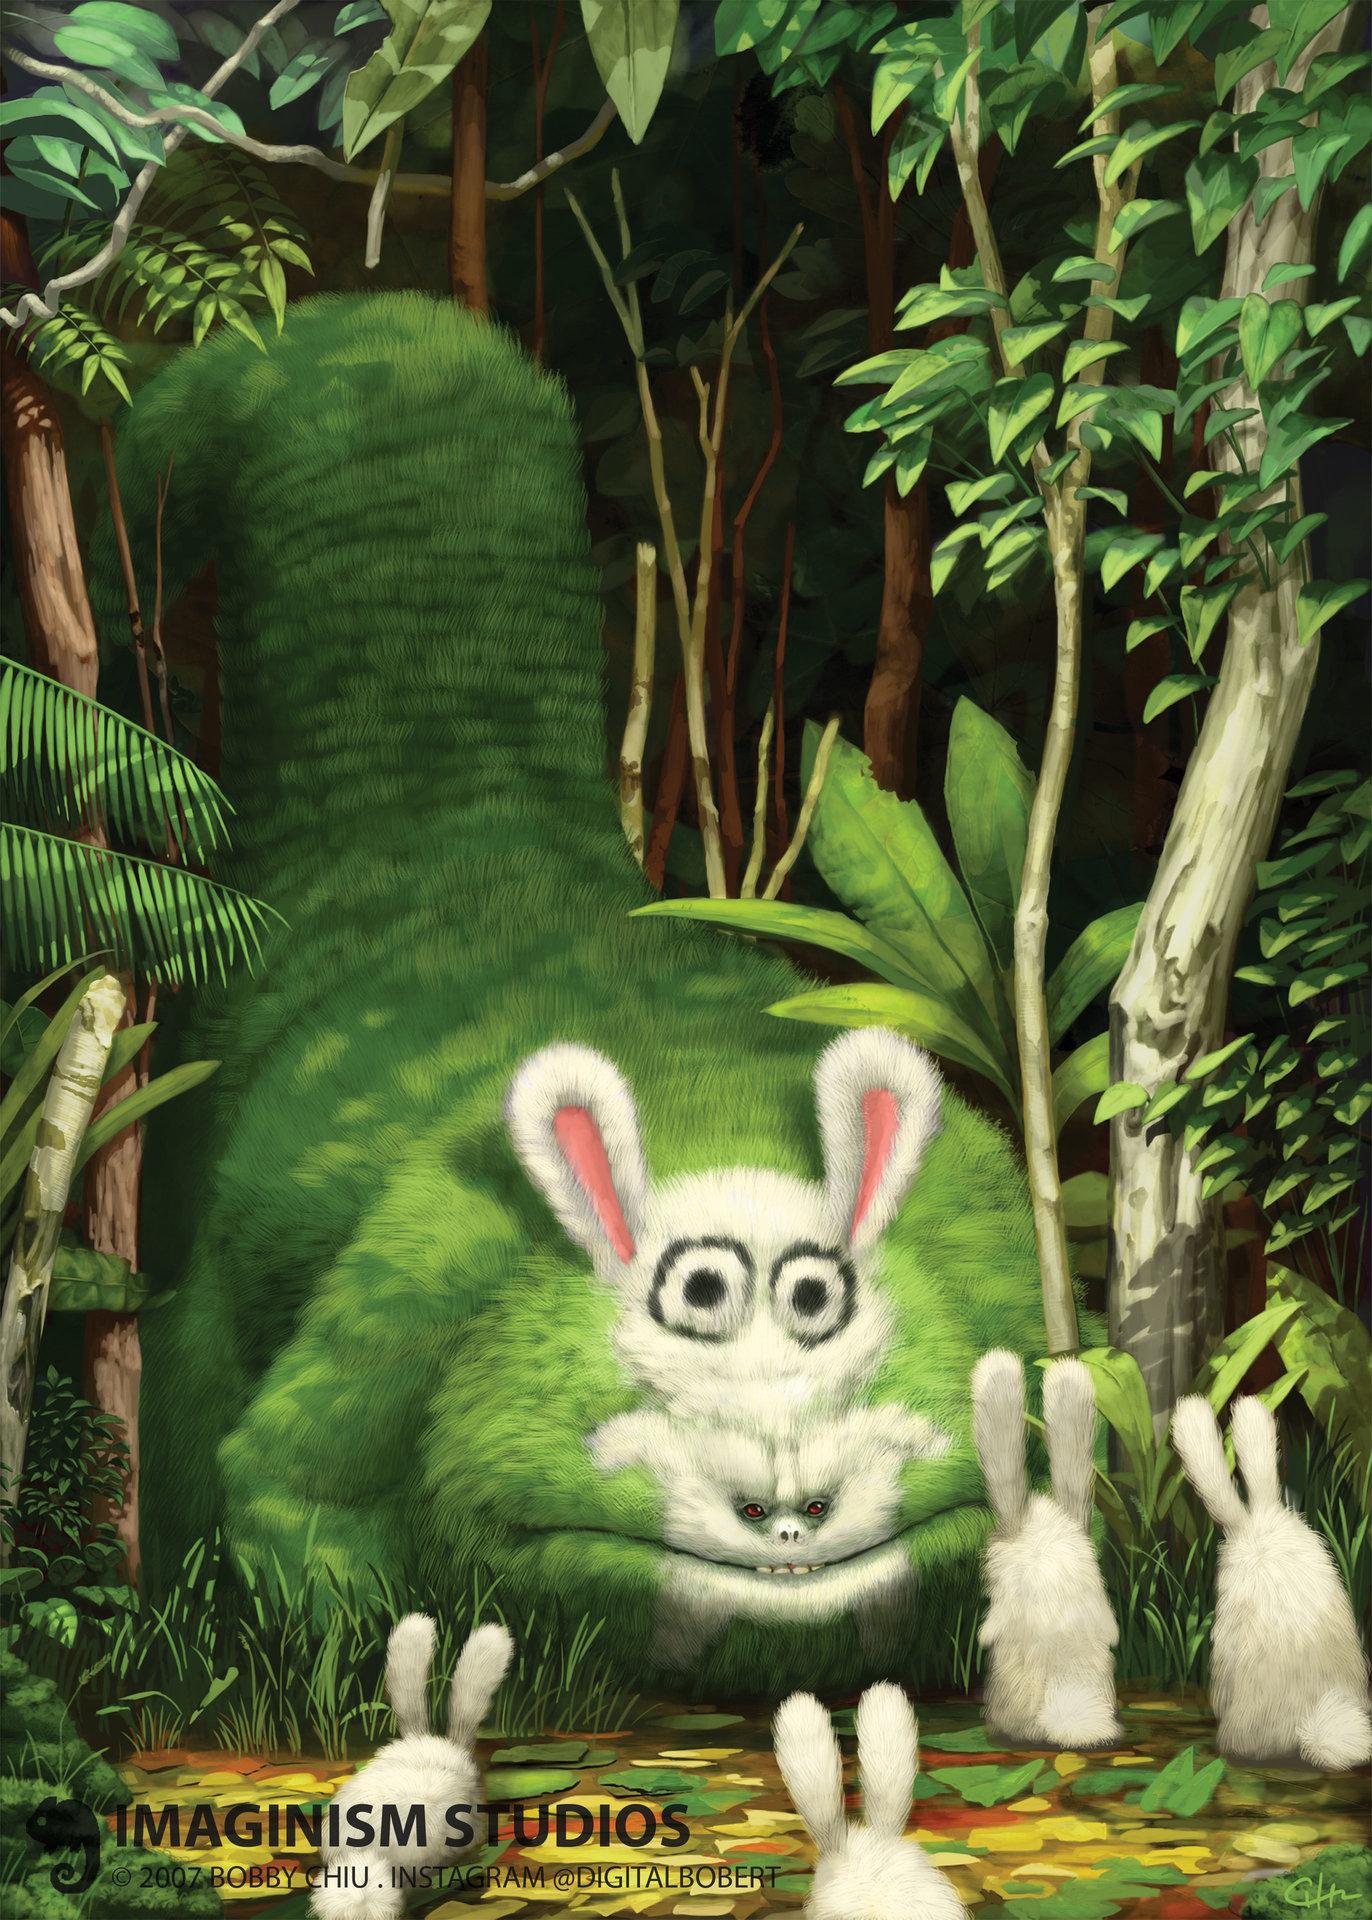 bobby-chiu-big-bad-bunny-eater.jpg